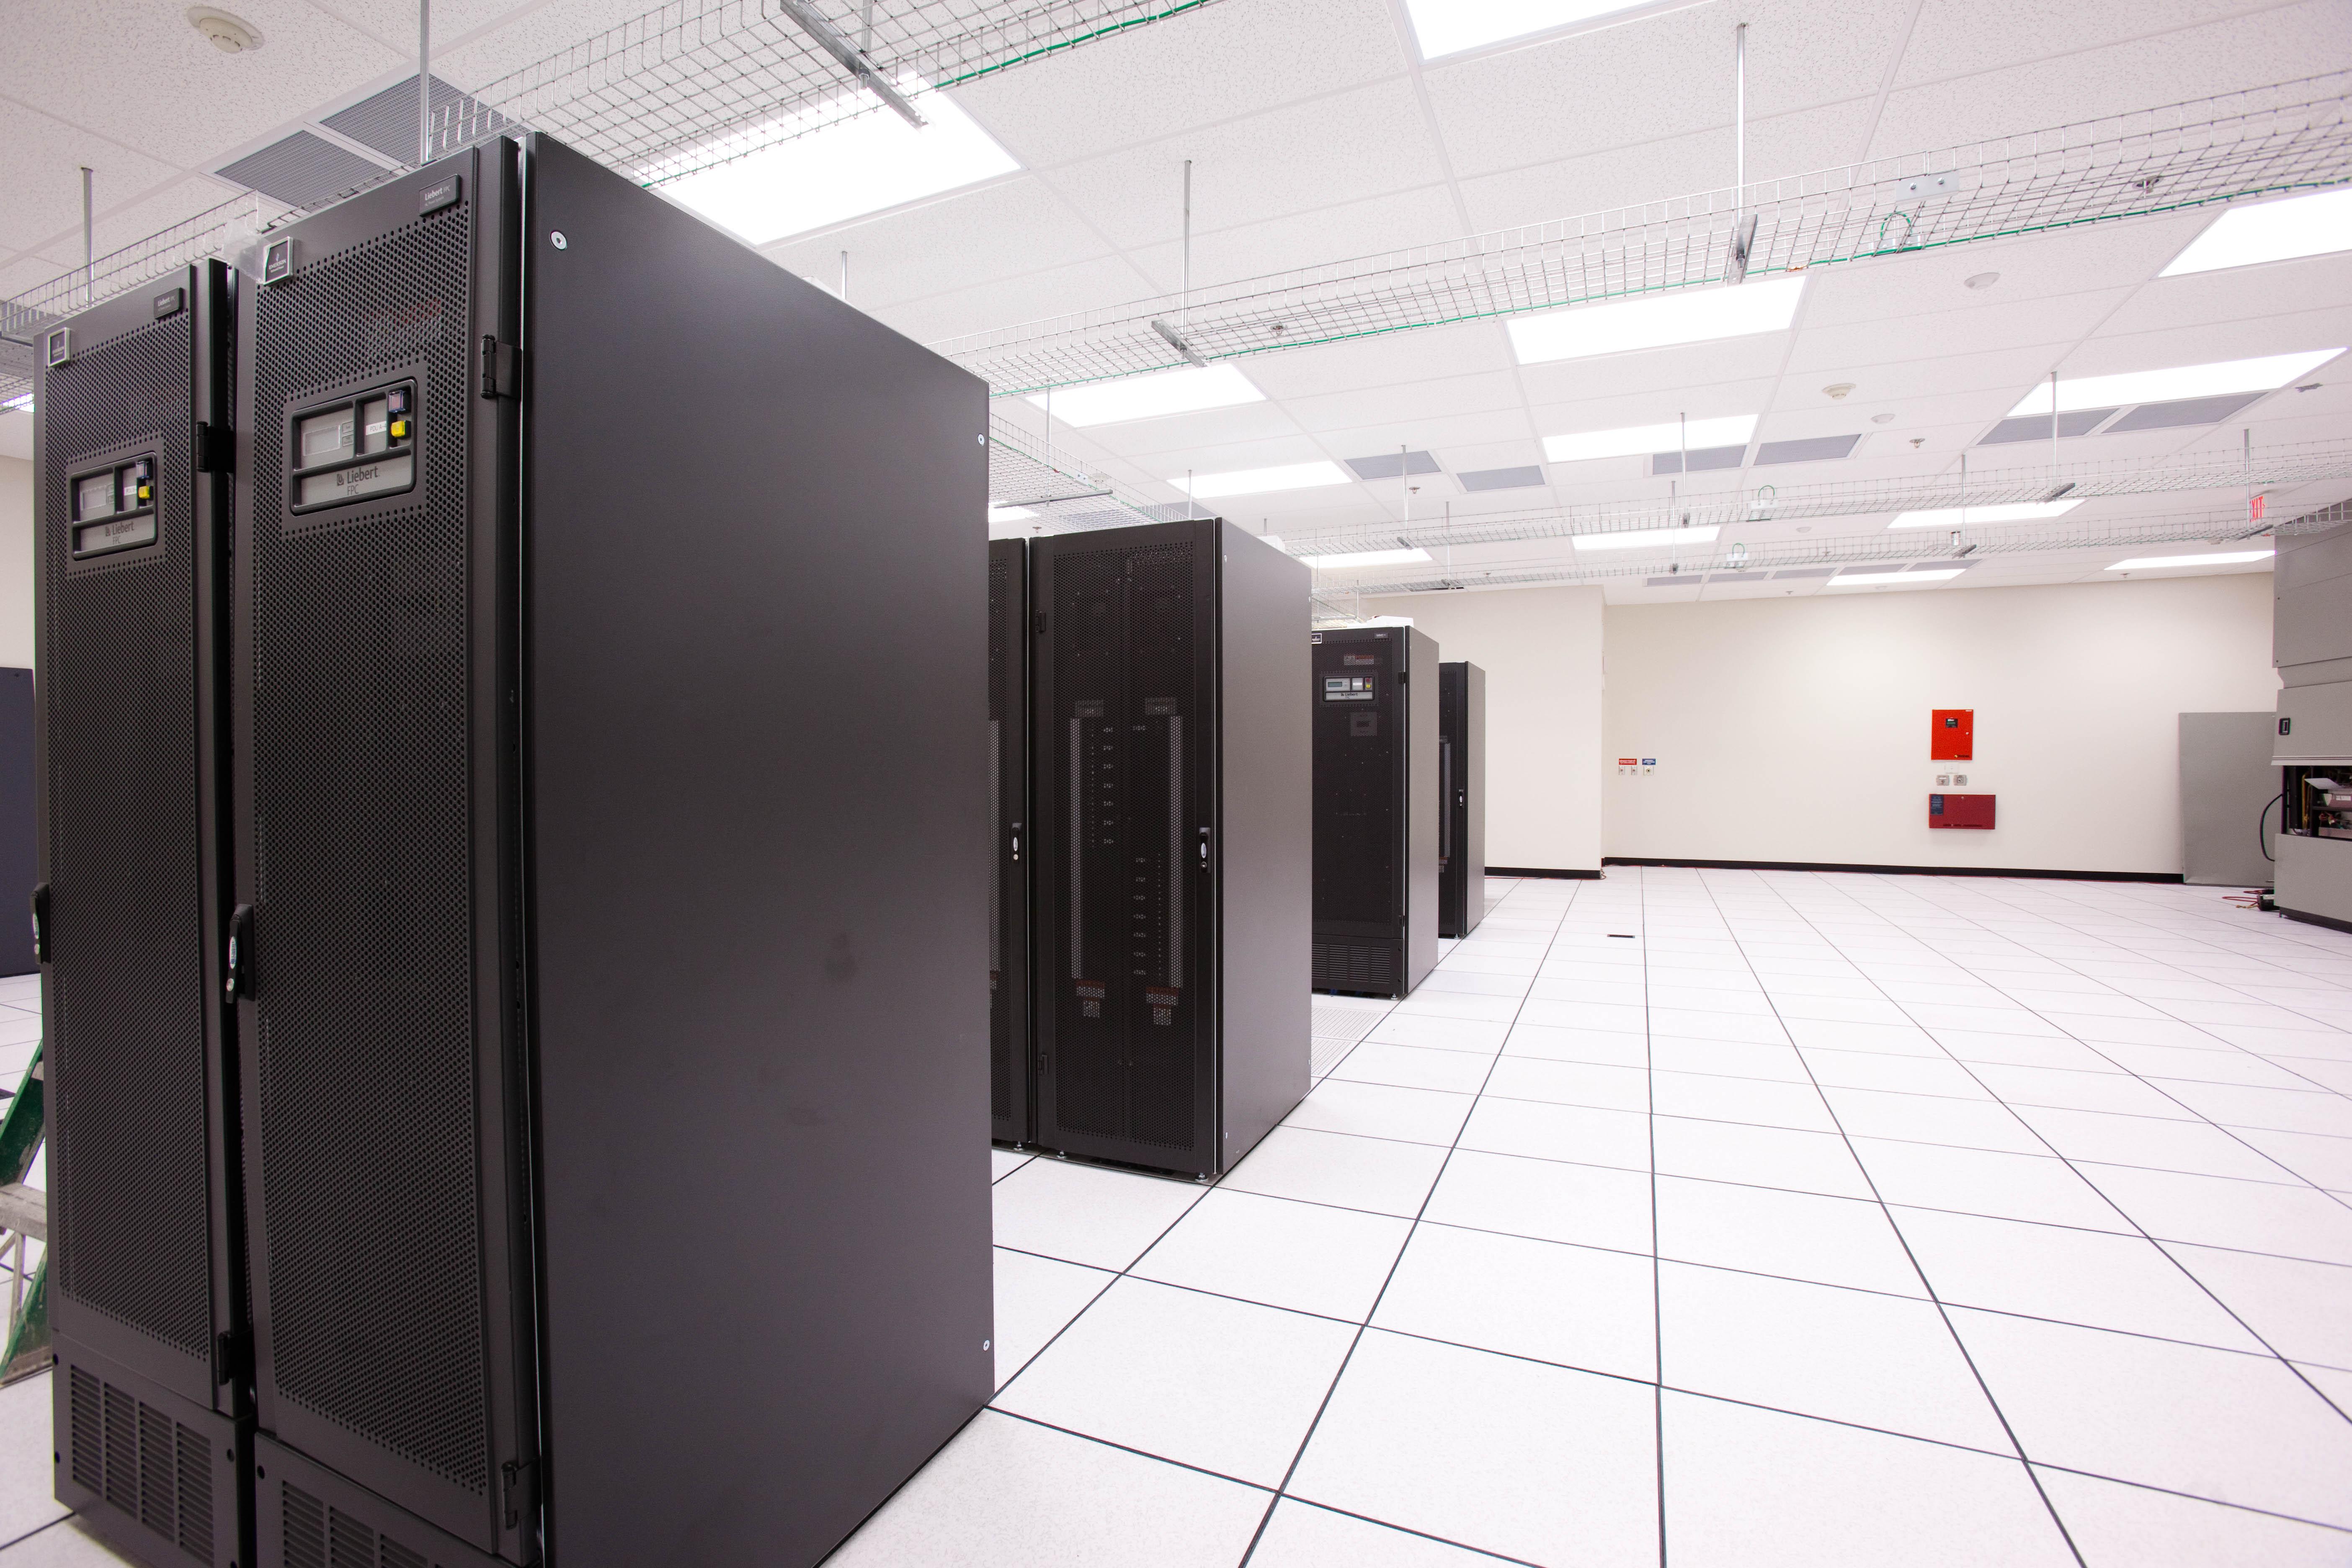 Prefabricated Modular Data Center Vs Traditional Data